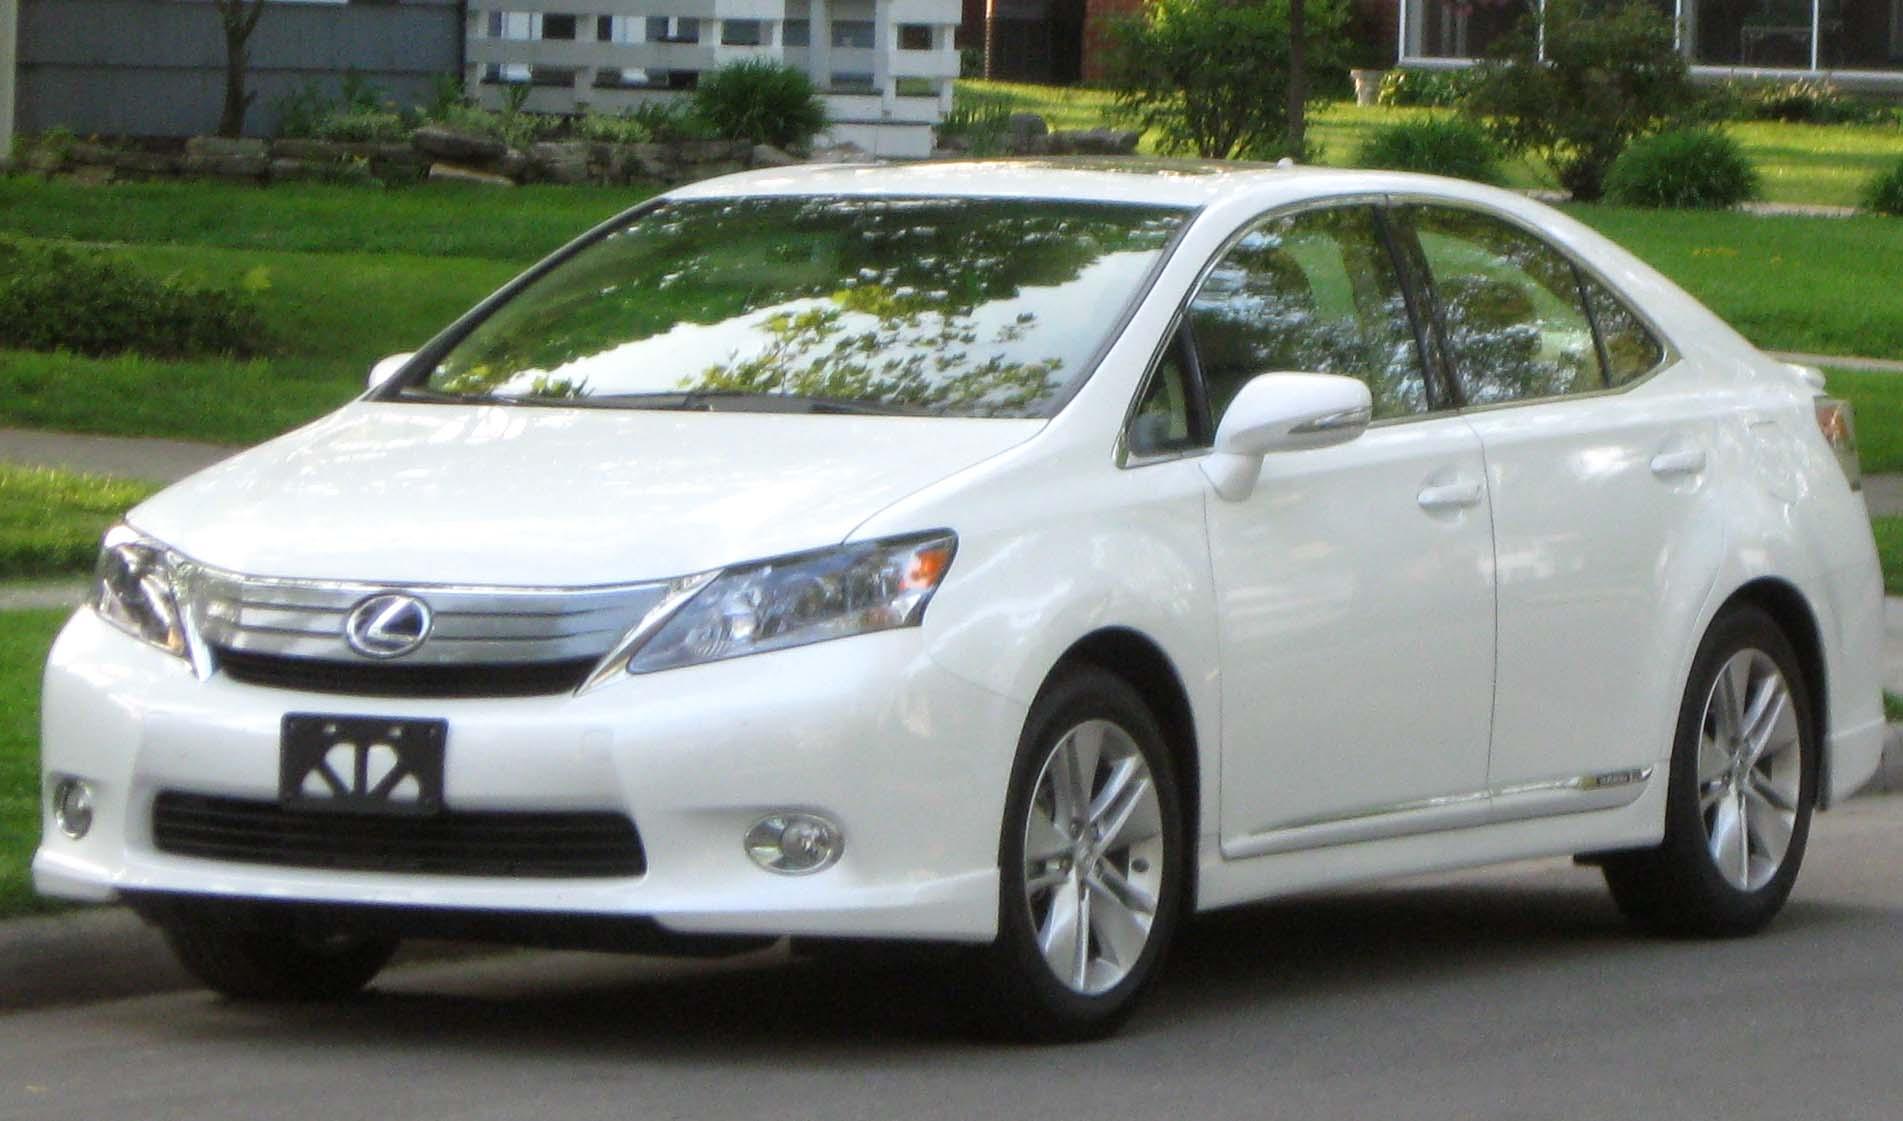 https://upload.wikimedia.org/wikipedia/commons/4/42/2010_Lexus_HS250h_--_04-30-2010.jpg